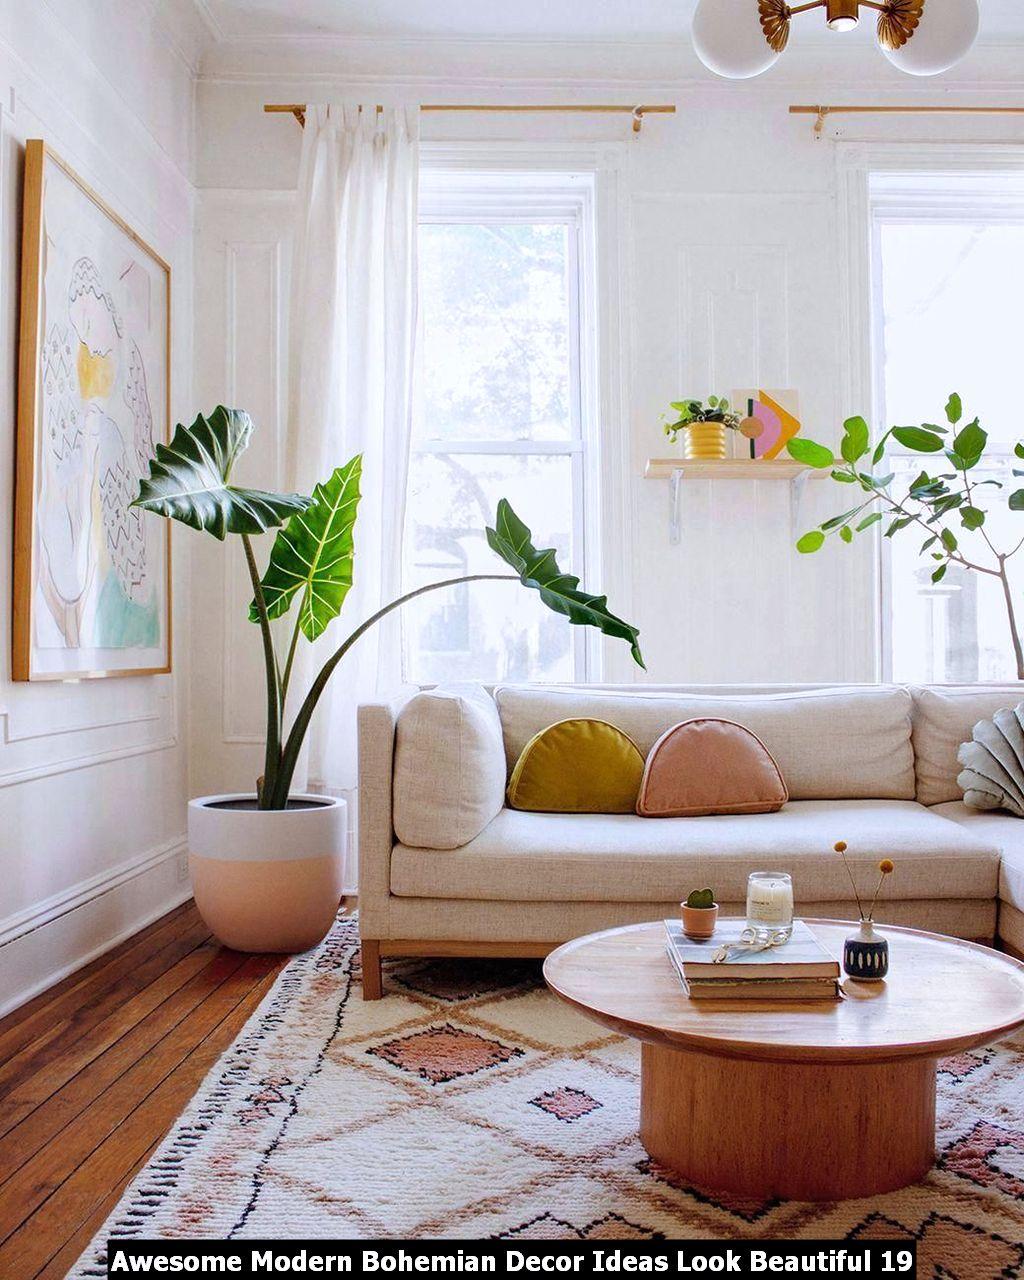 Awesome Modern Bohemian Decor Ideas Look Beautiful 19